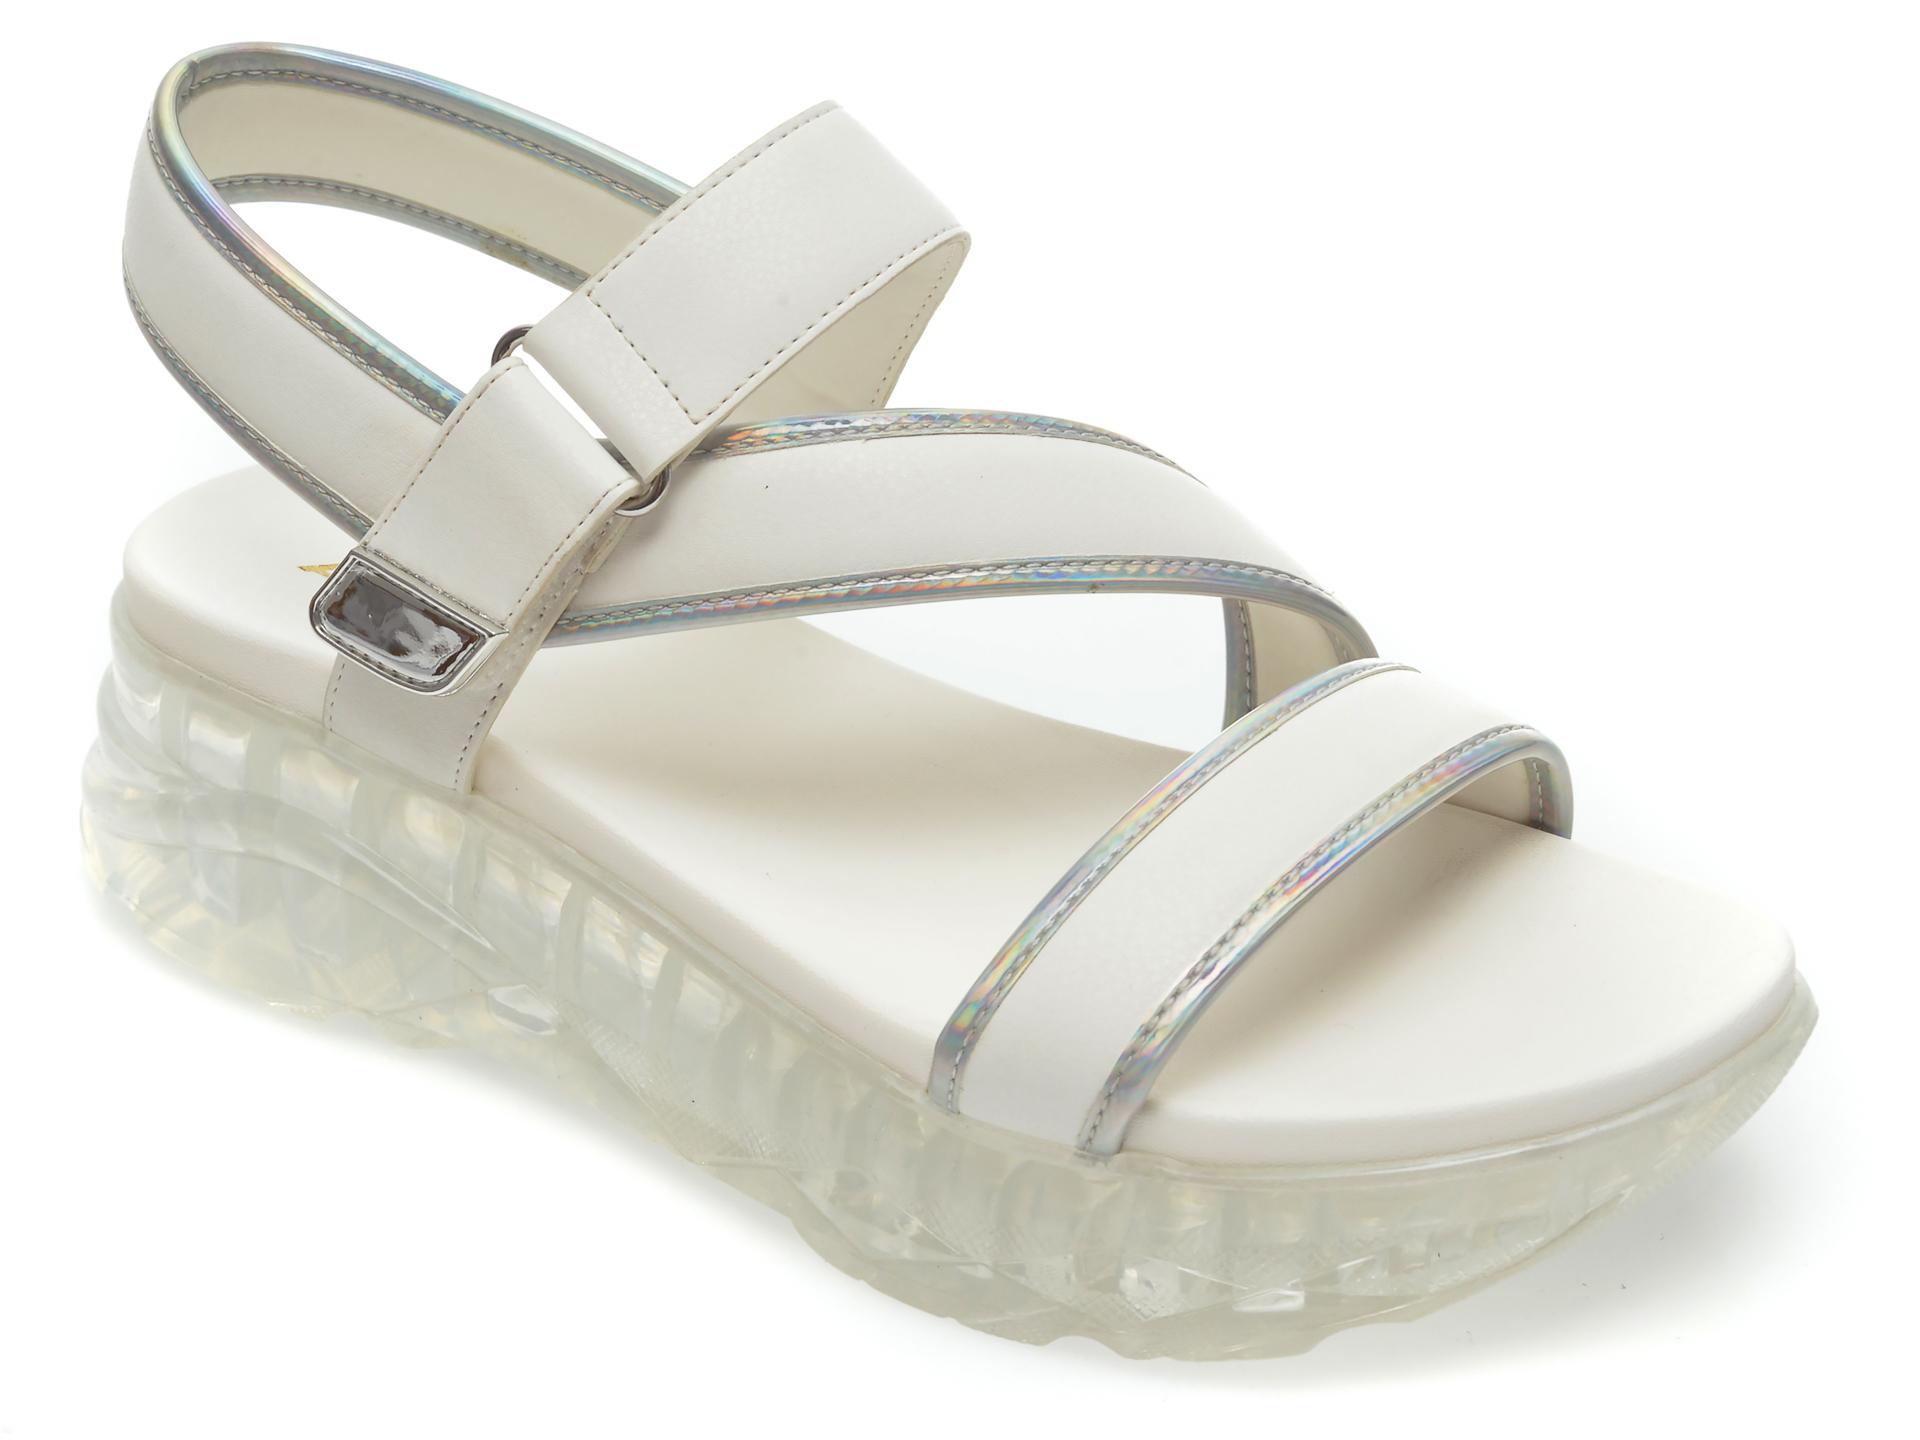 Sandale ALDO albe, Diosma100, din piele ecologica imagine otter.ro